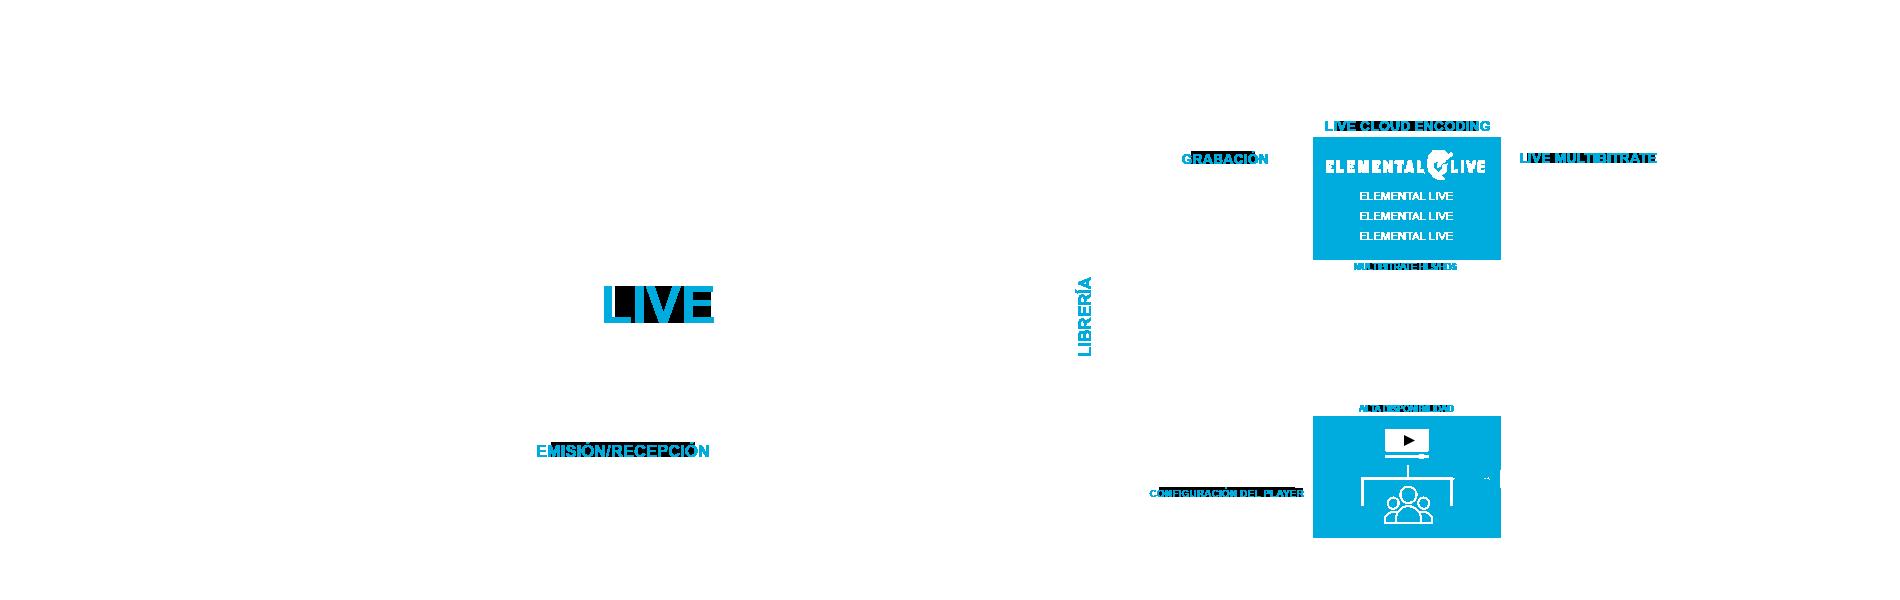 mest-livestreaming